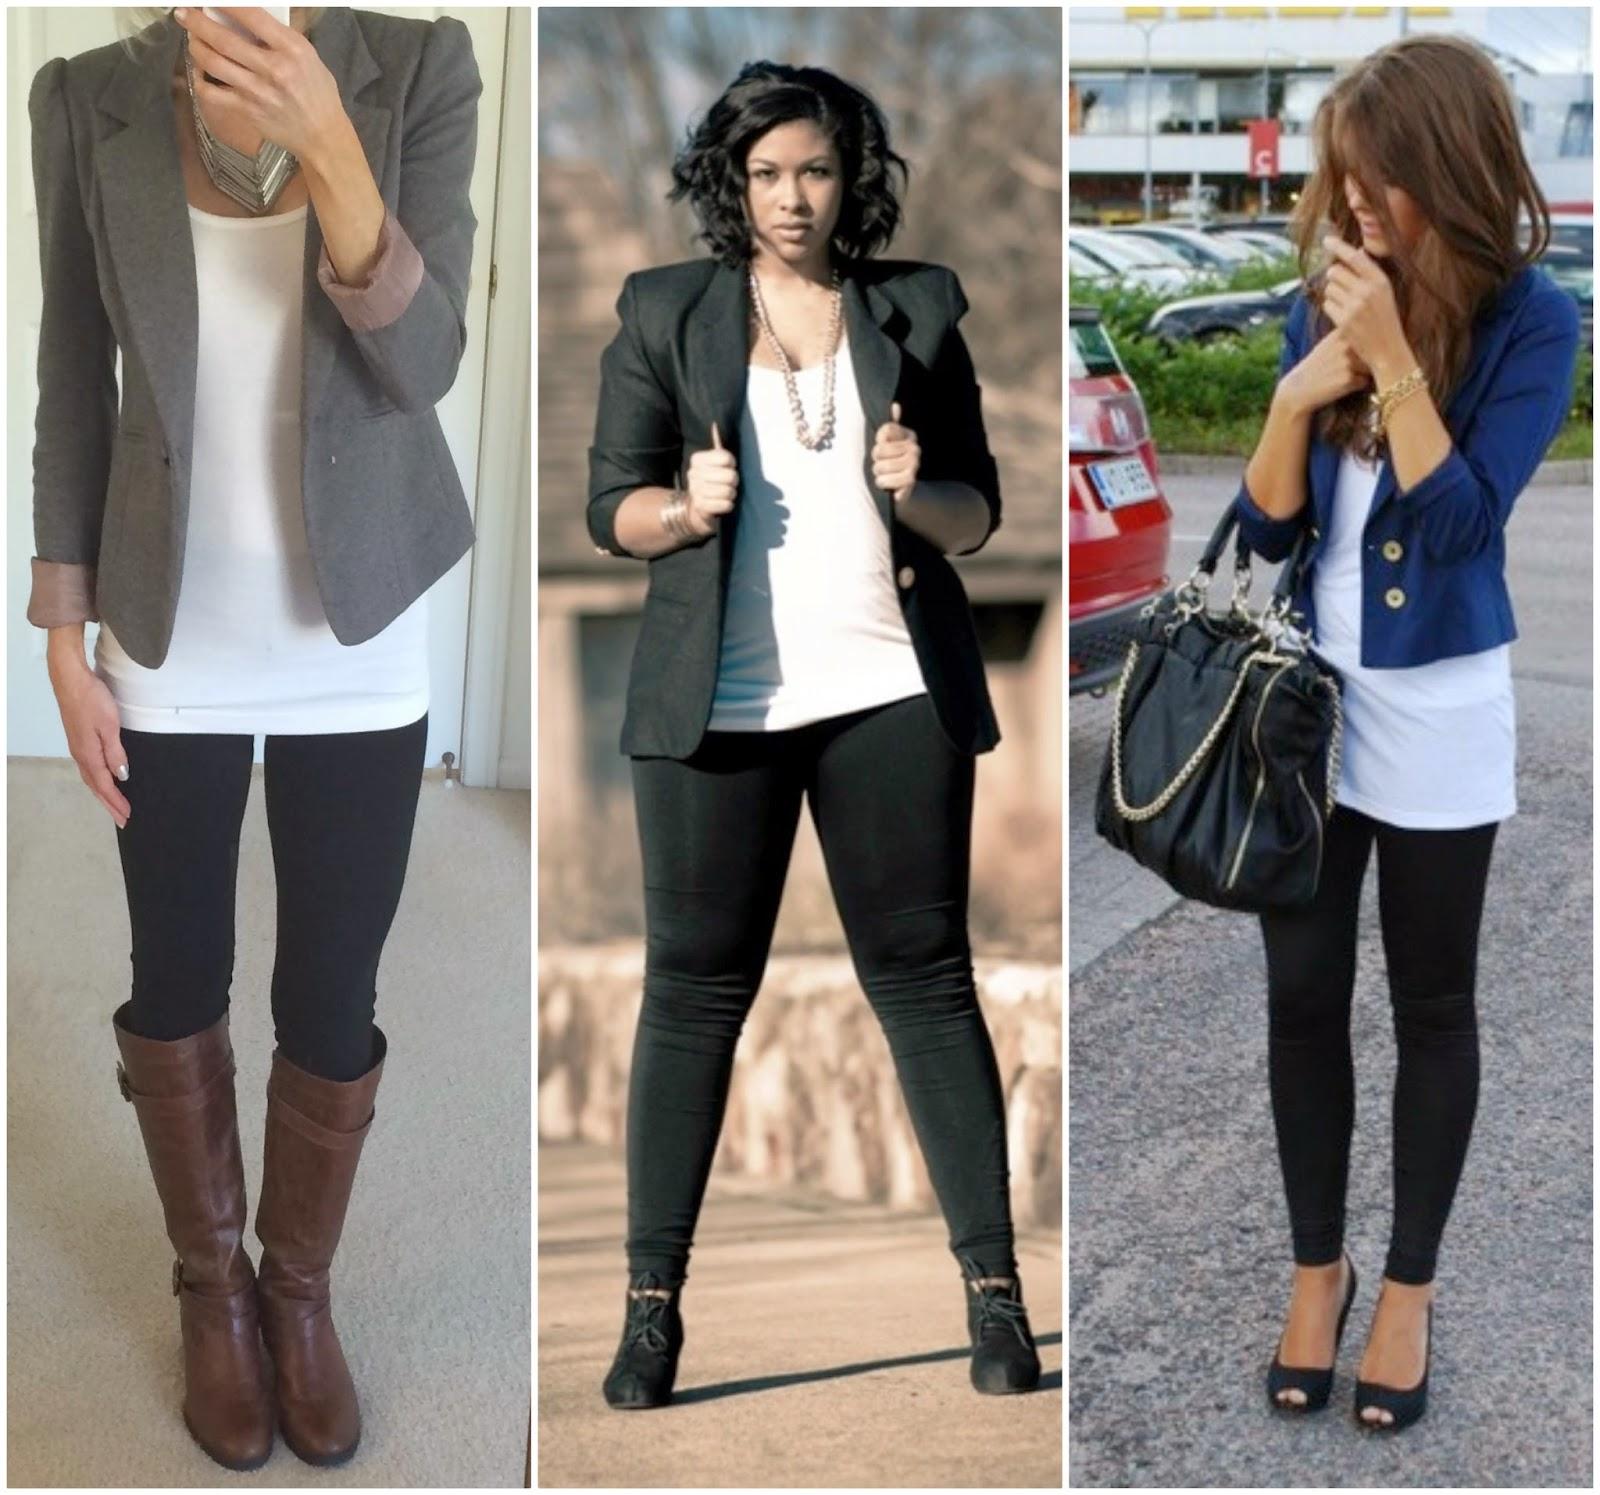 leggings outfits pinterest - photo #3